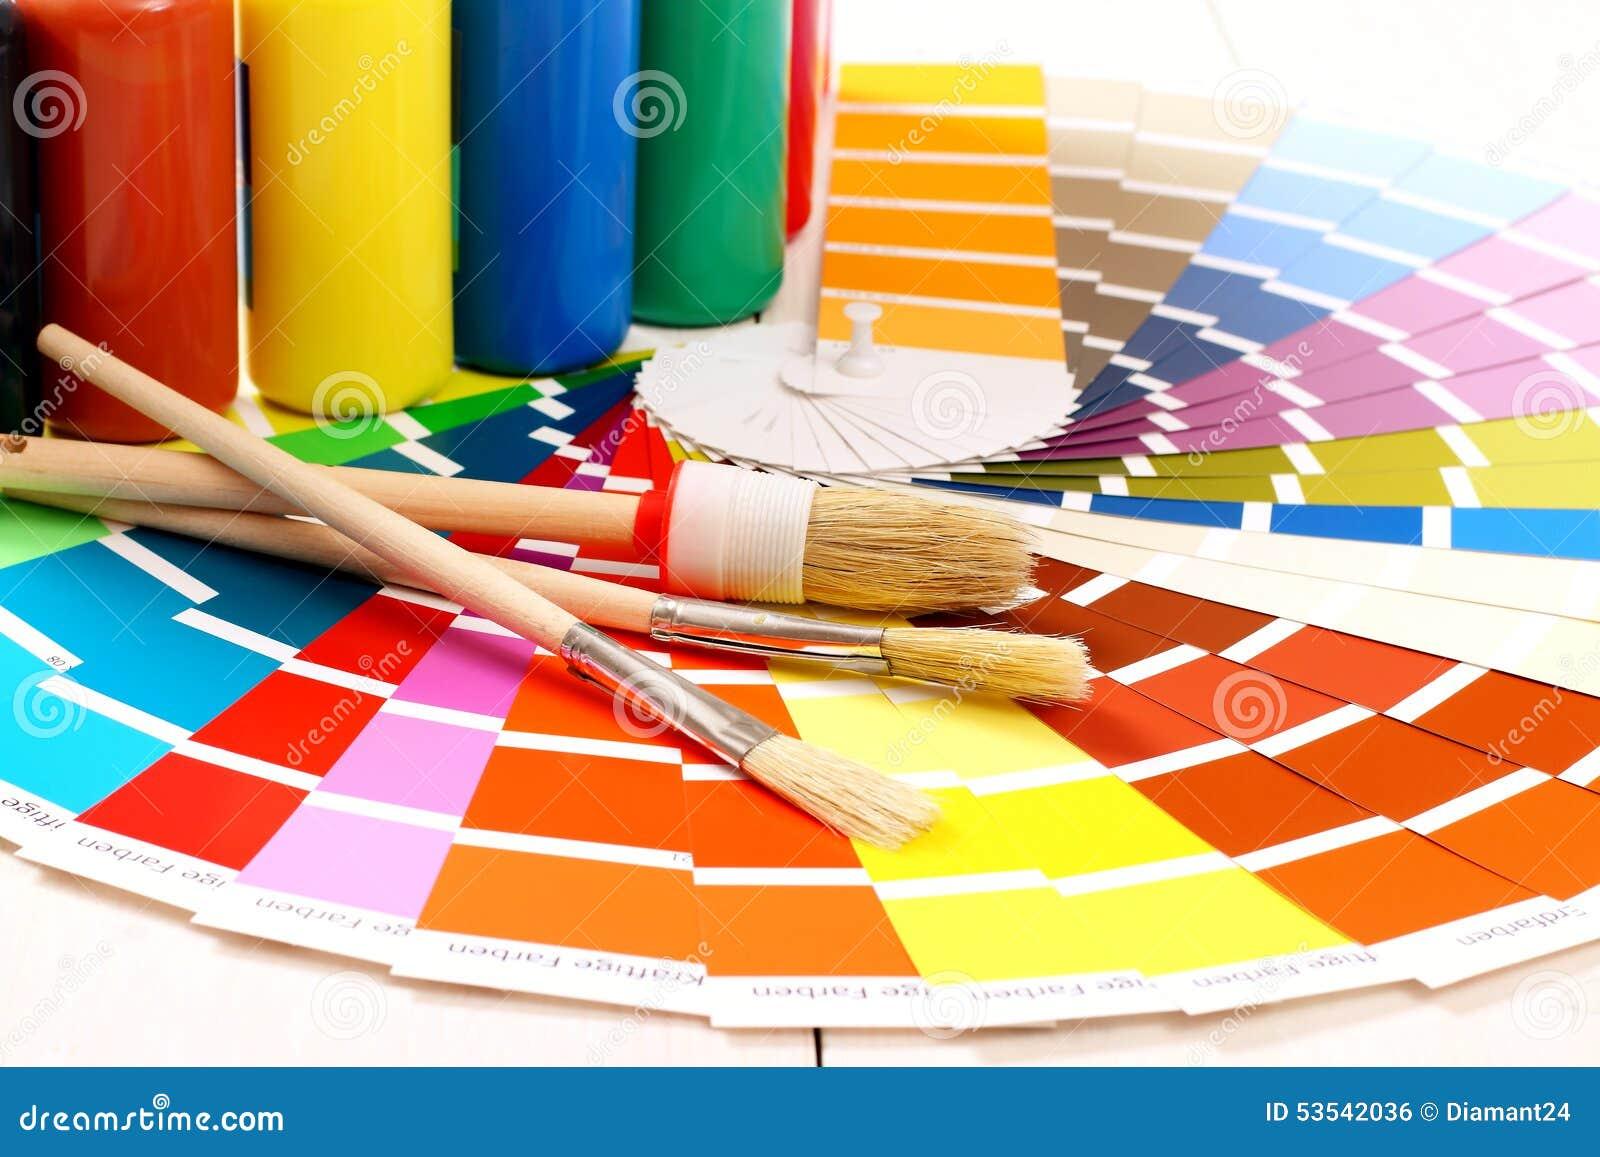 Pantone Color Palette, Brush On White Background Stock ...